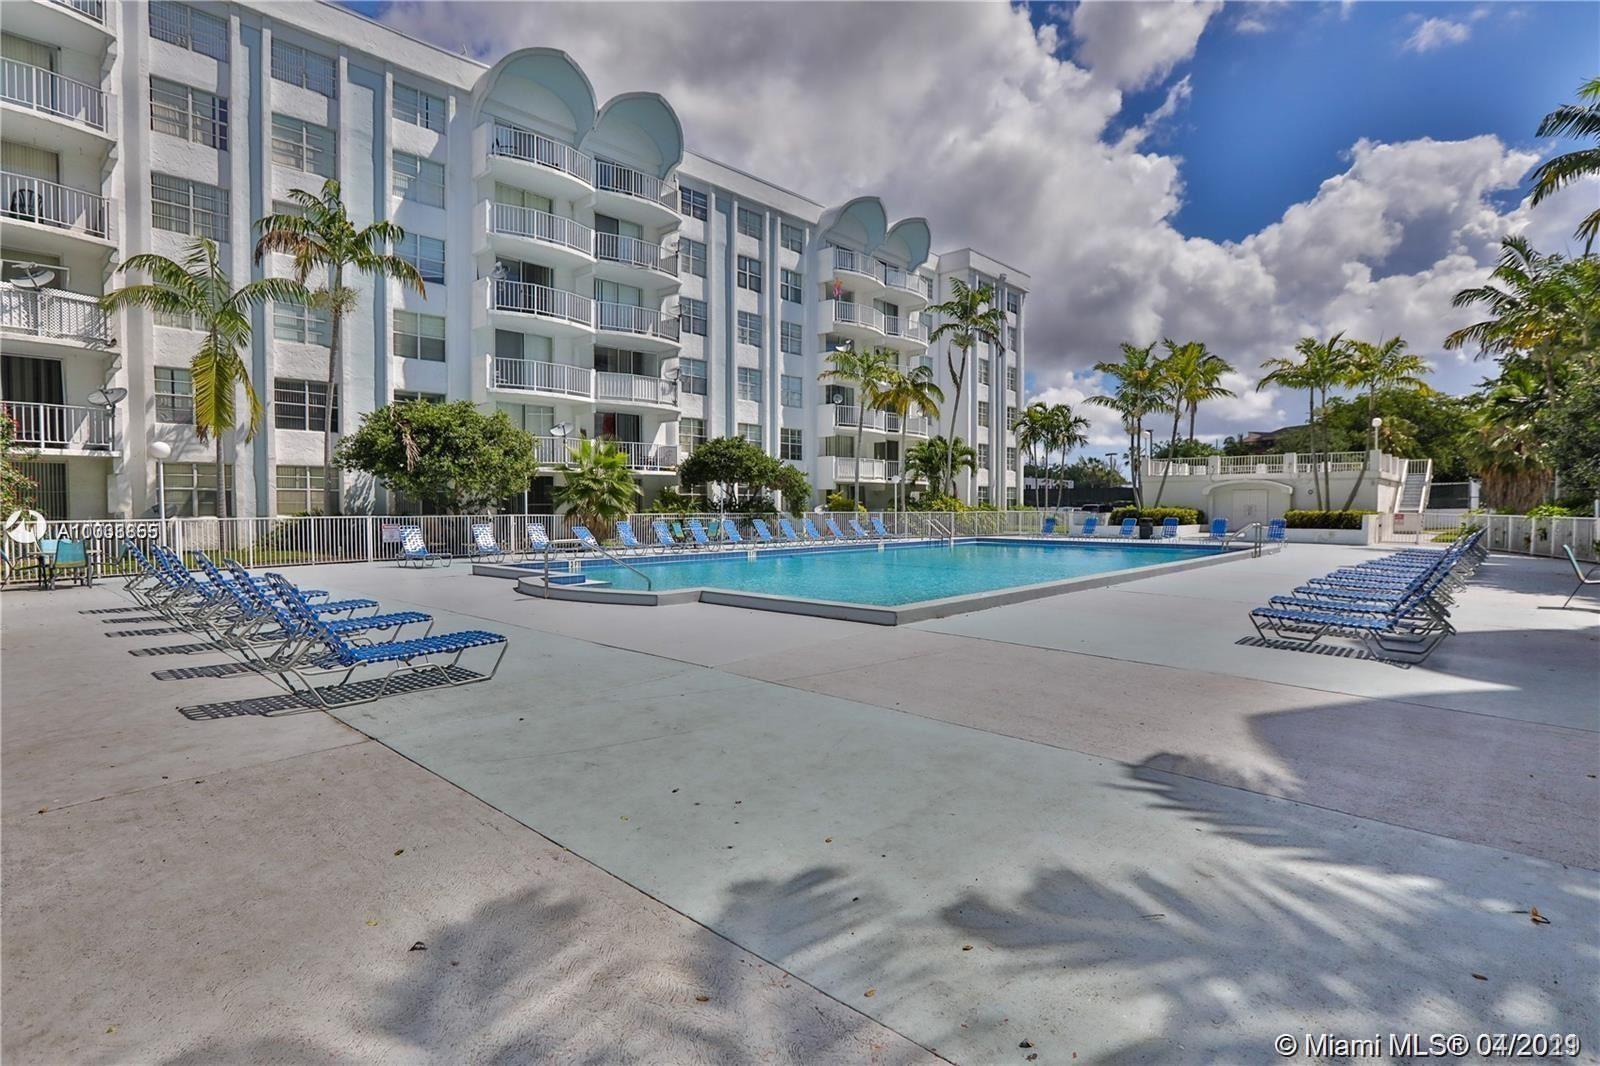 494 NW 165th Street Rd #C408, Miami, FL 33169 - #: A11033855